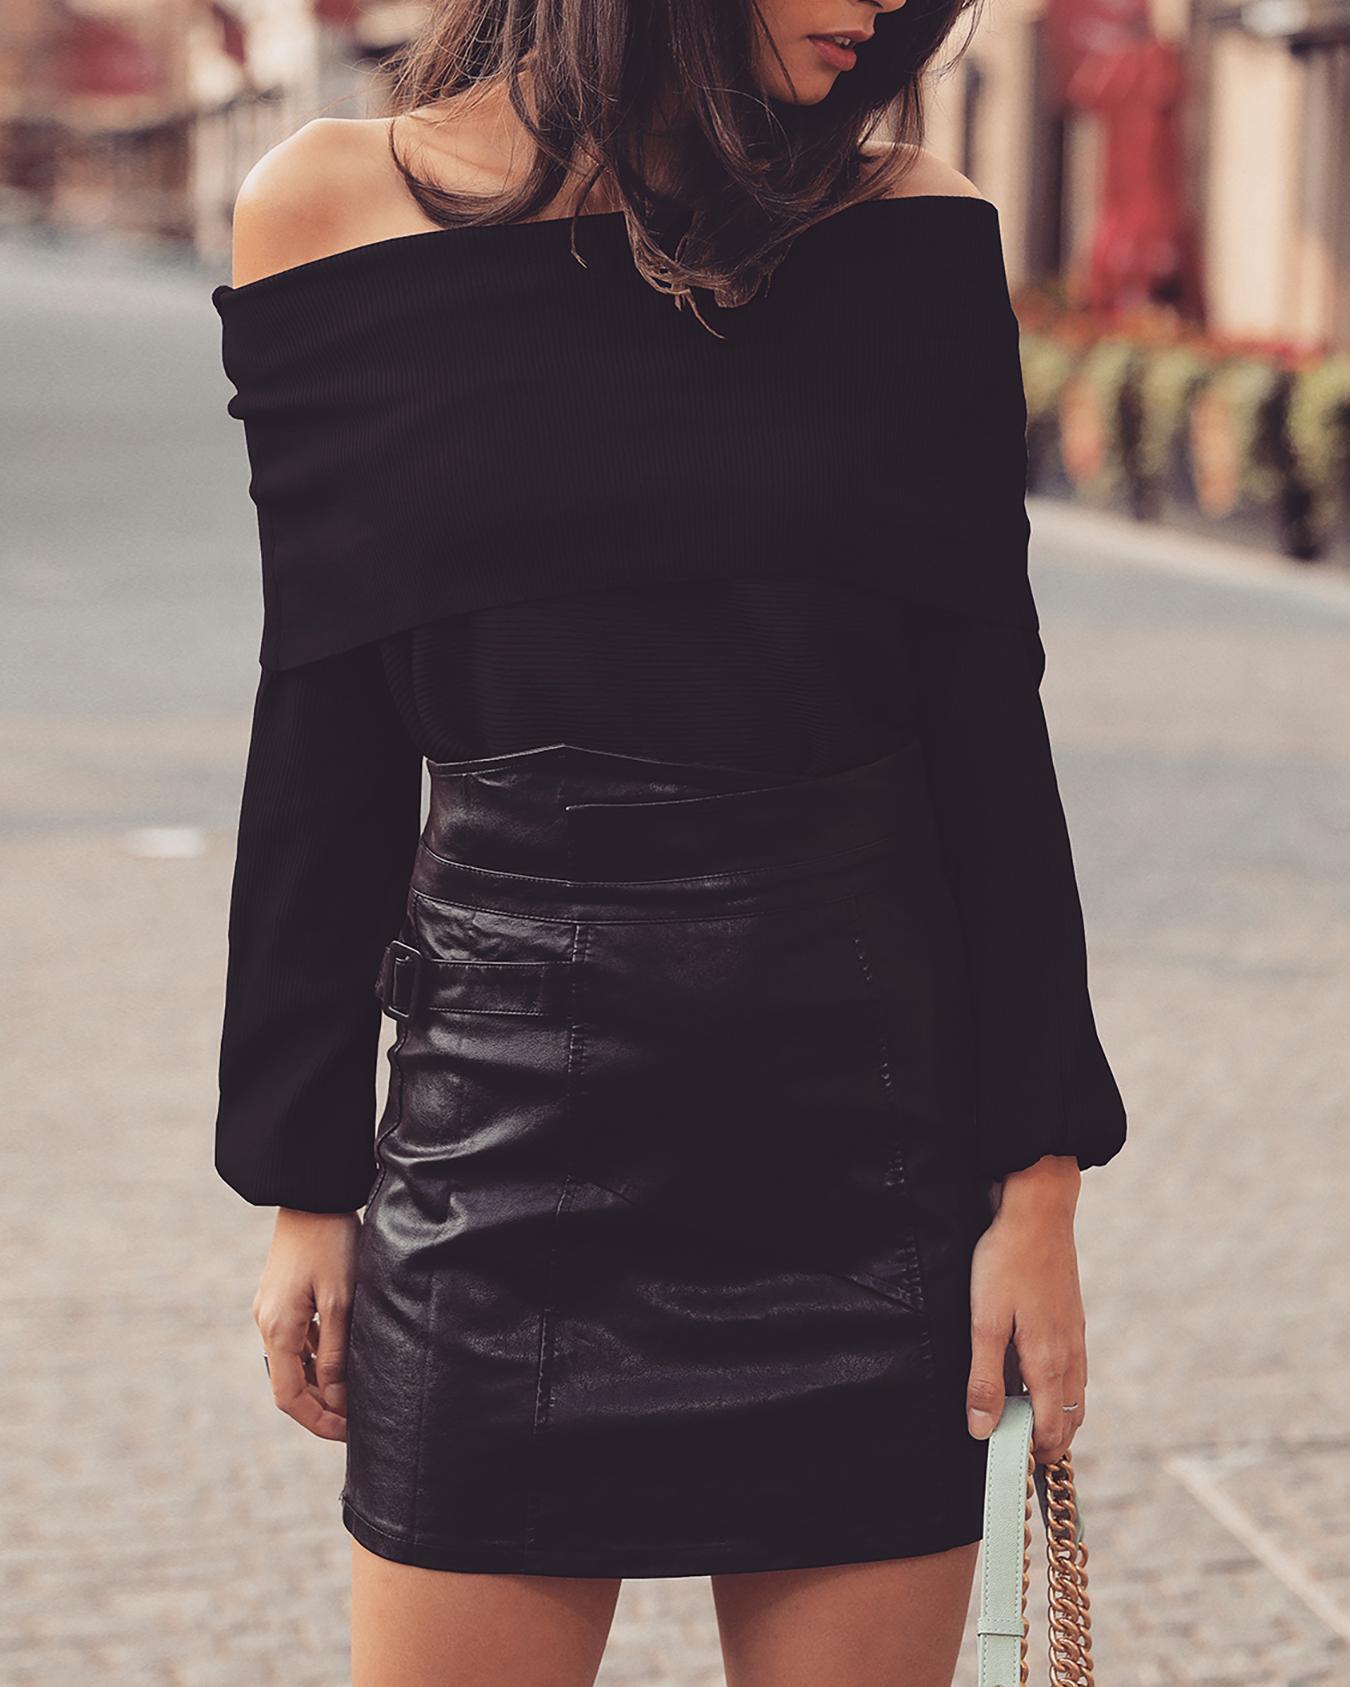 Fold-Over Off Shoulder Casual Blouse